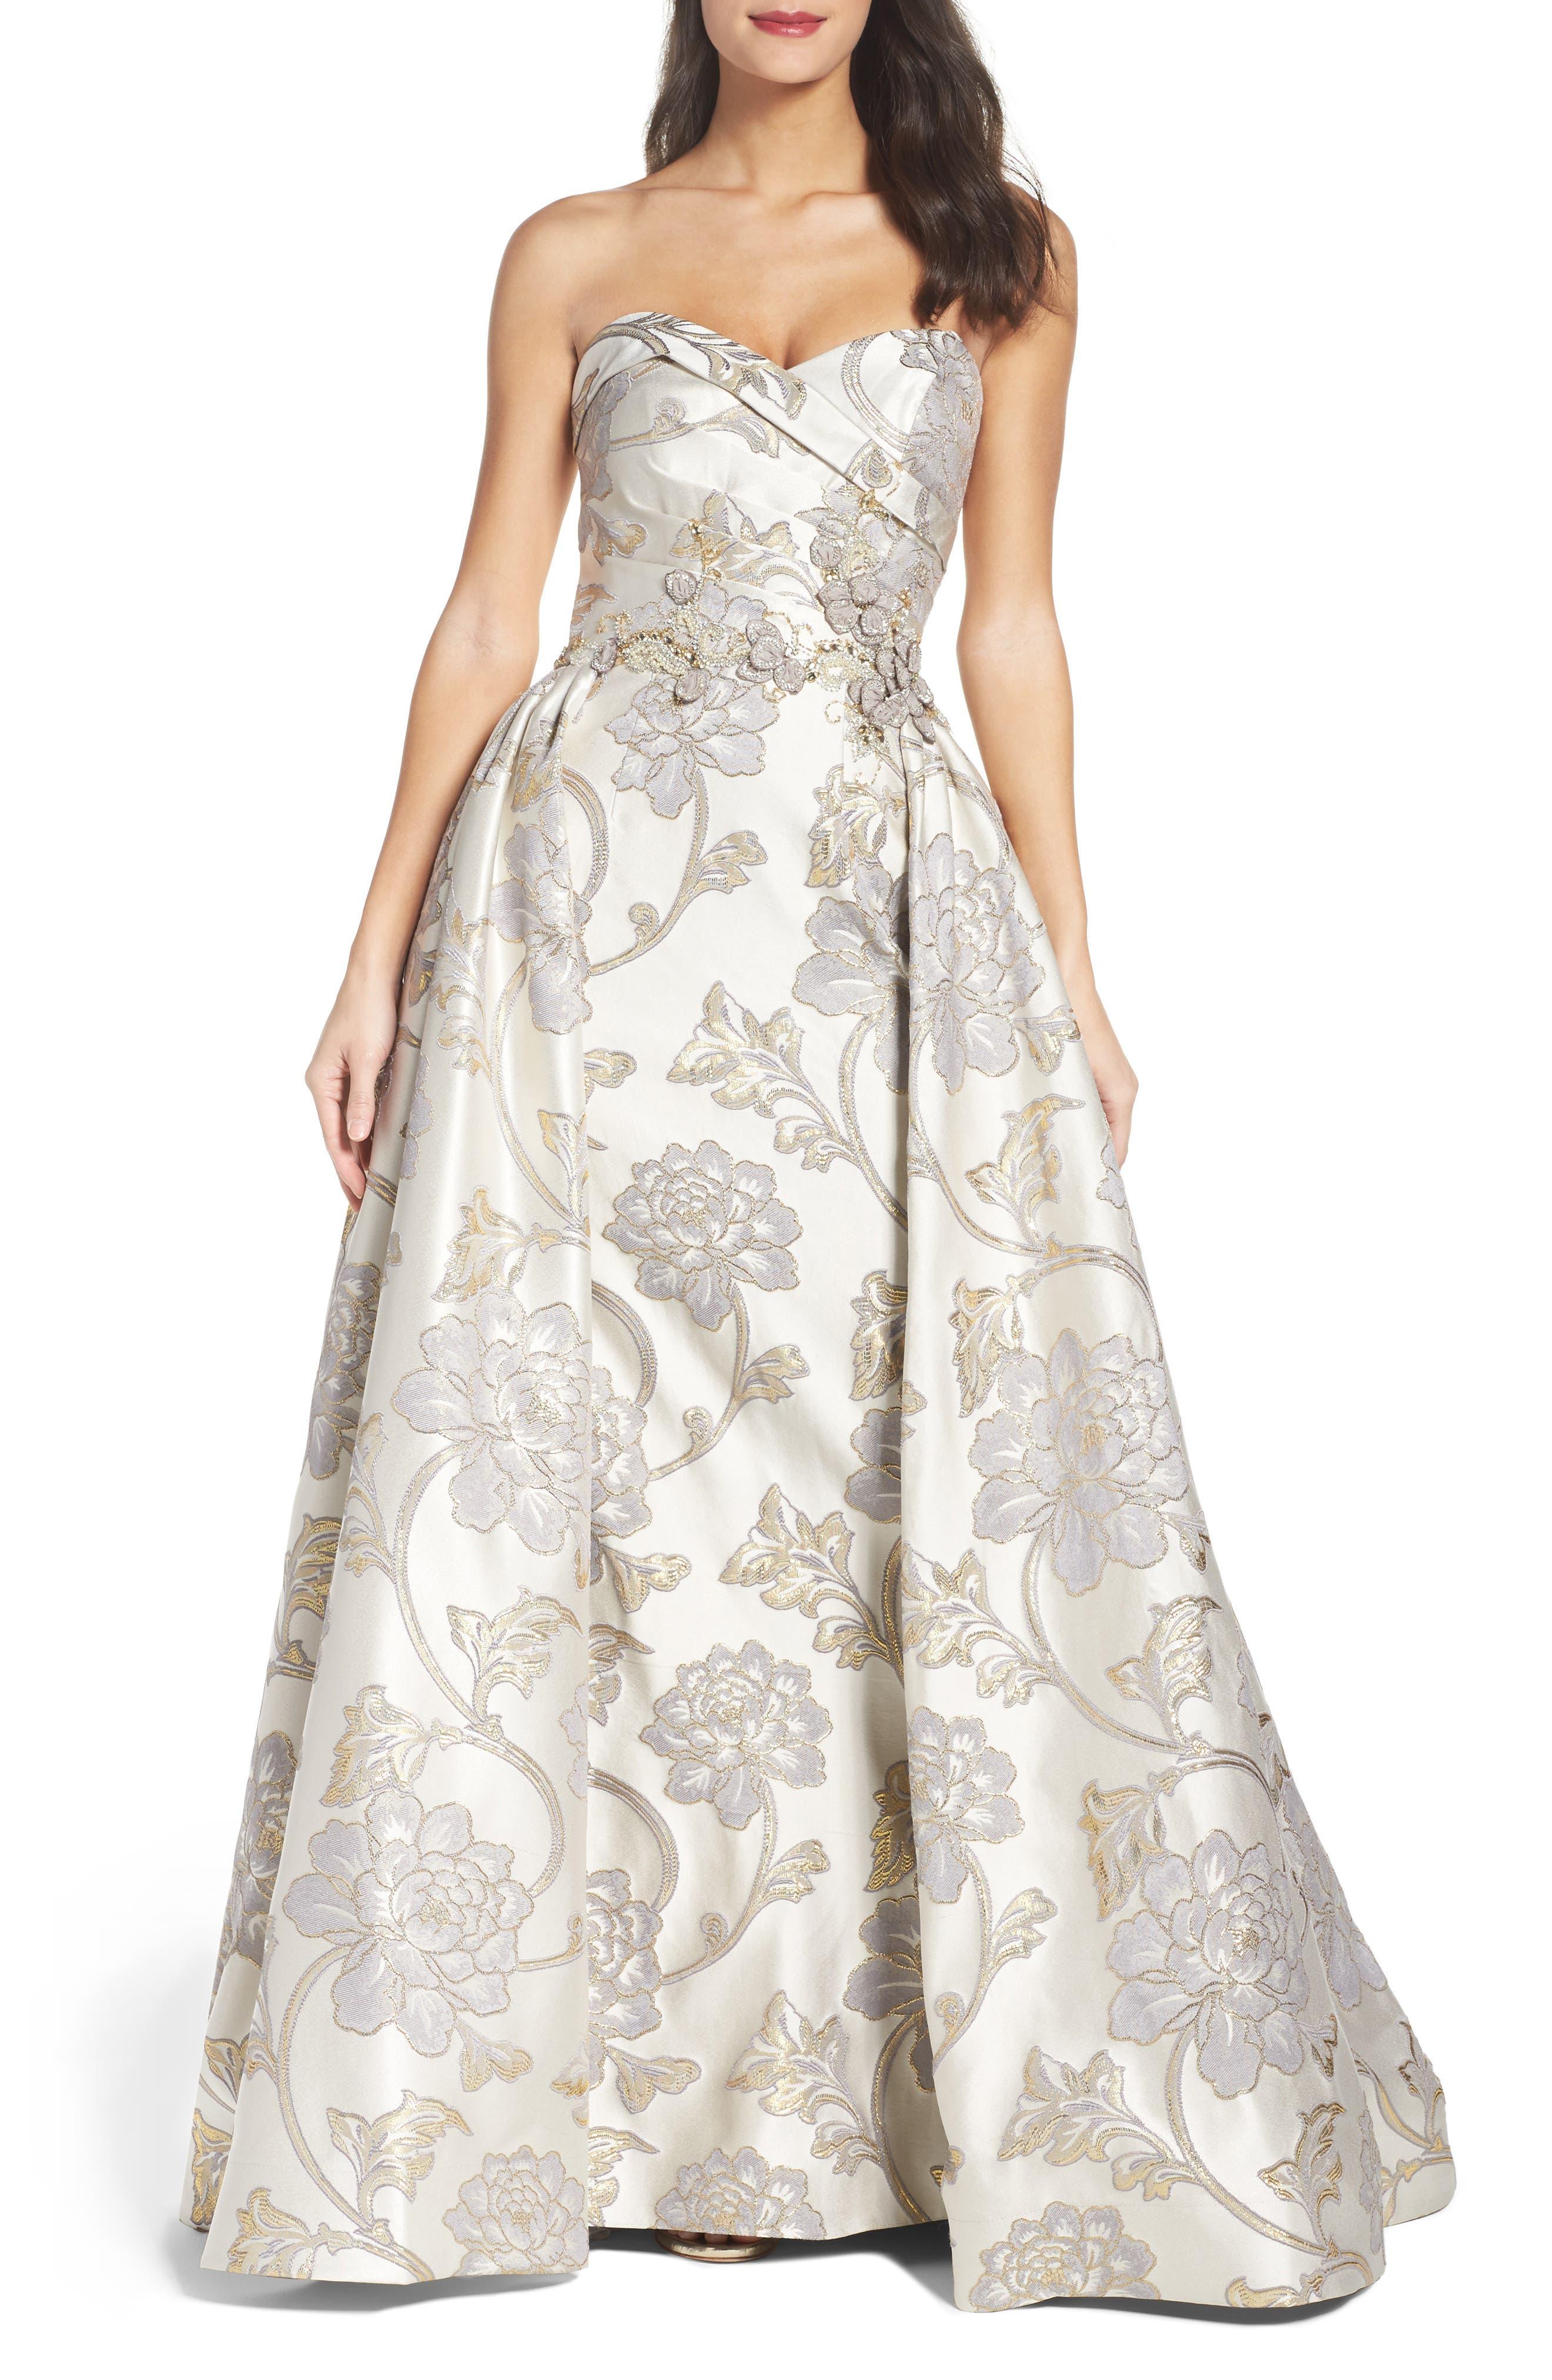 Alternate Image 1 Selected - Mac Duggal Metallic Brocade Gown